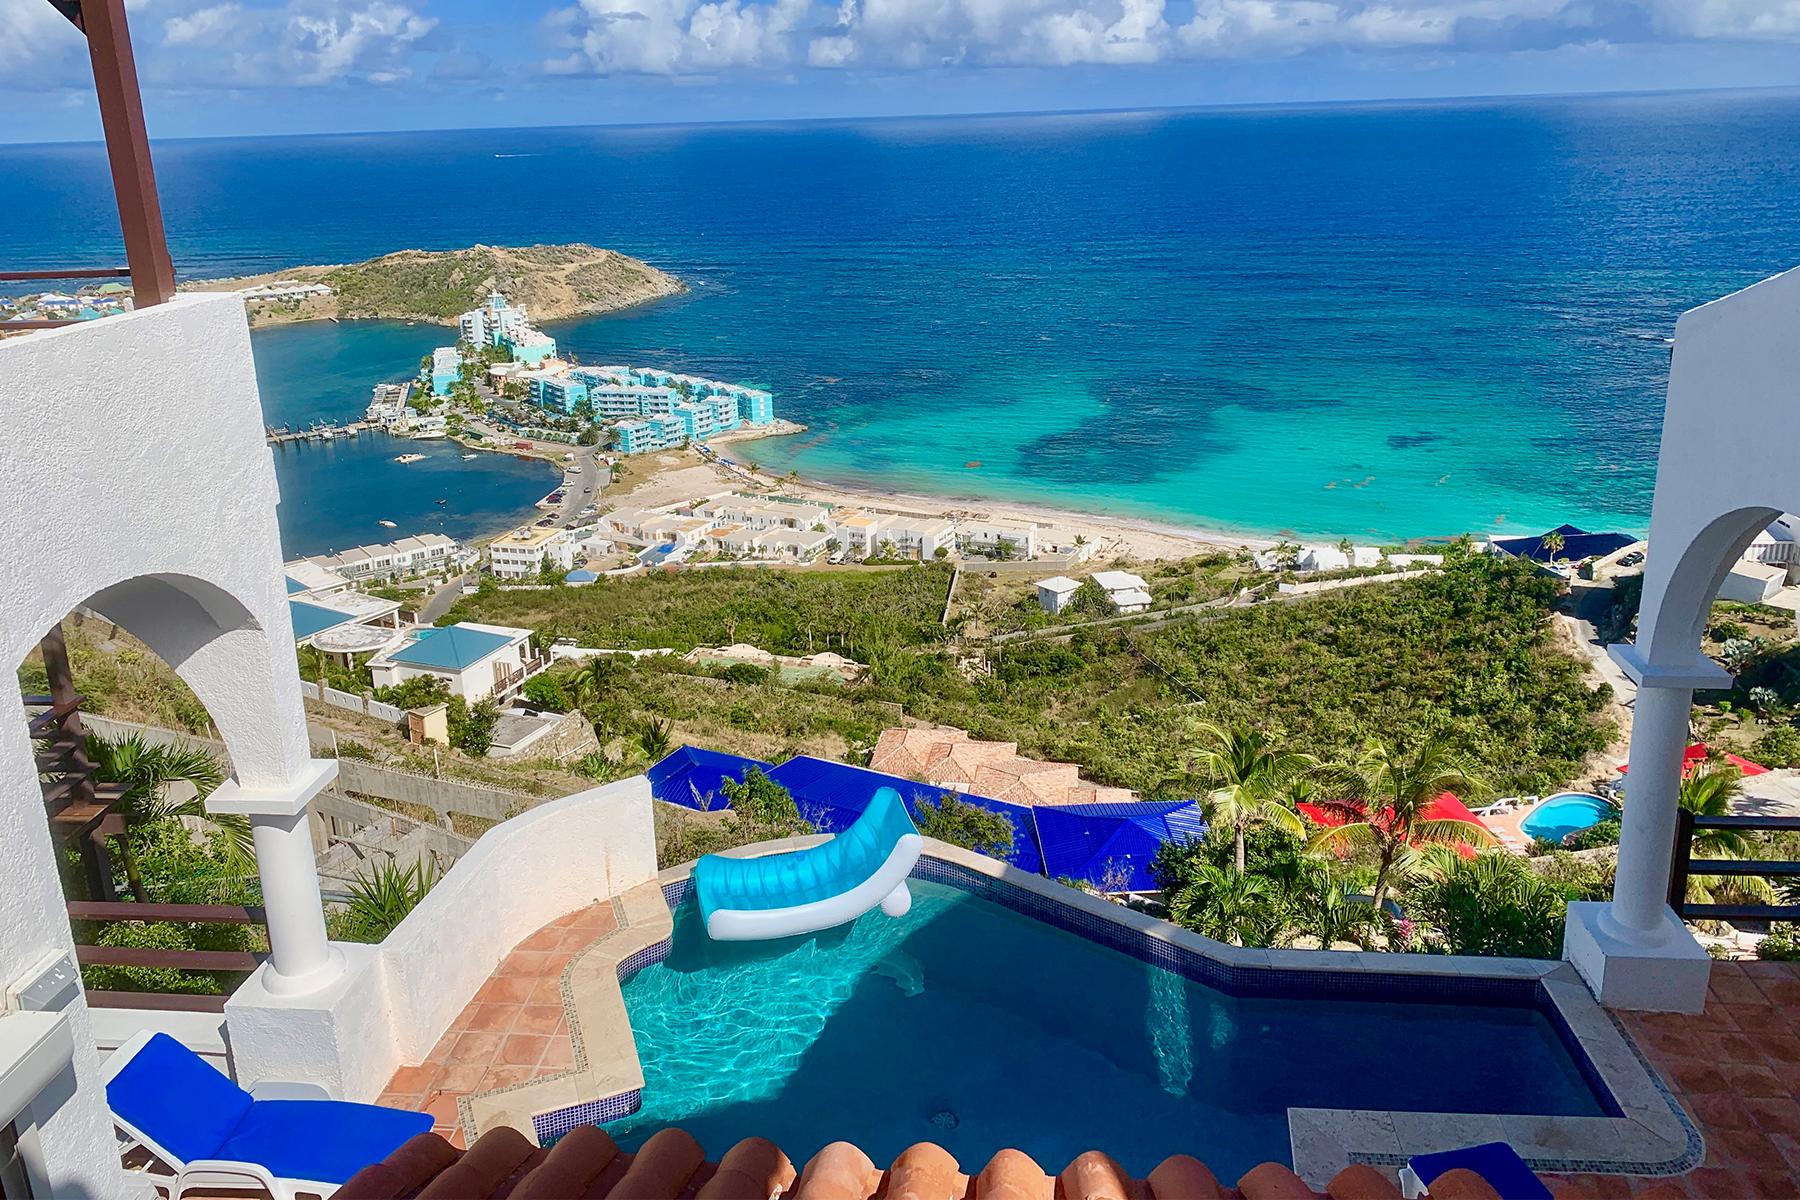 Single Family Homes for Sale at Villa Leones Oyster Pond, Cities In Sint Maarten St. Maarten